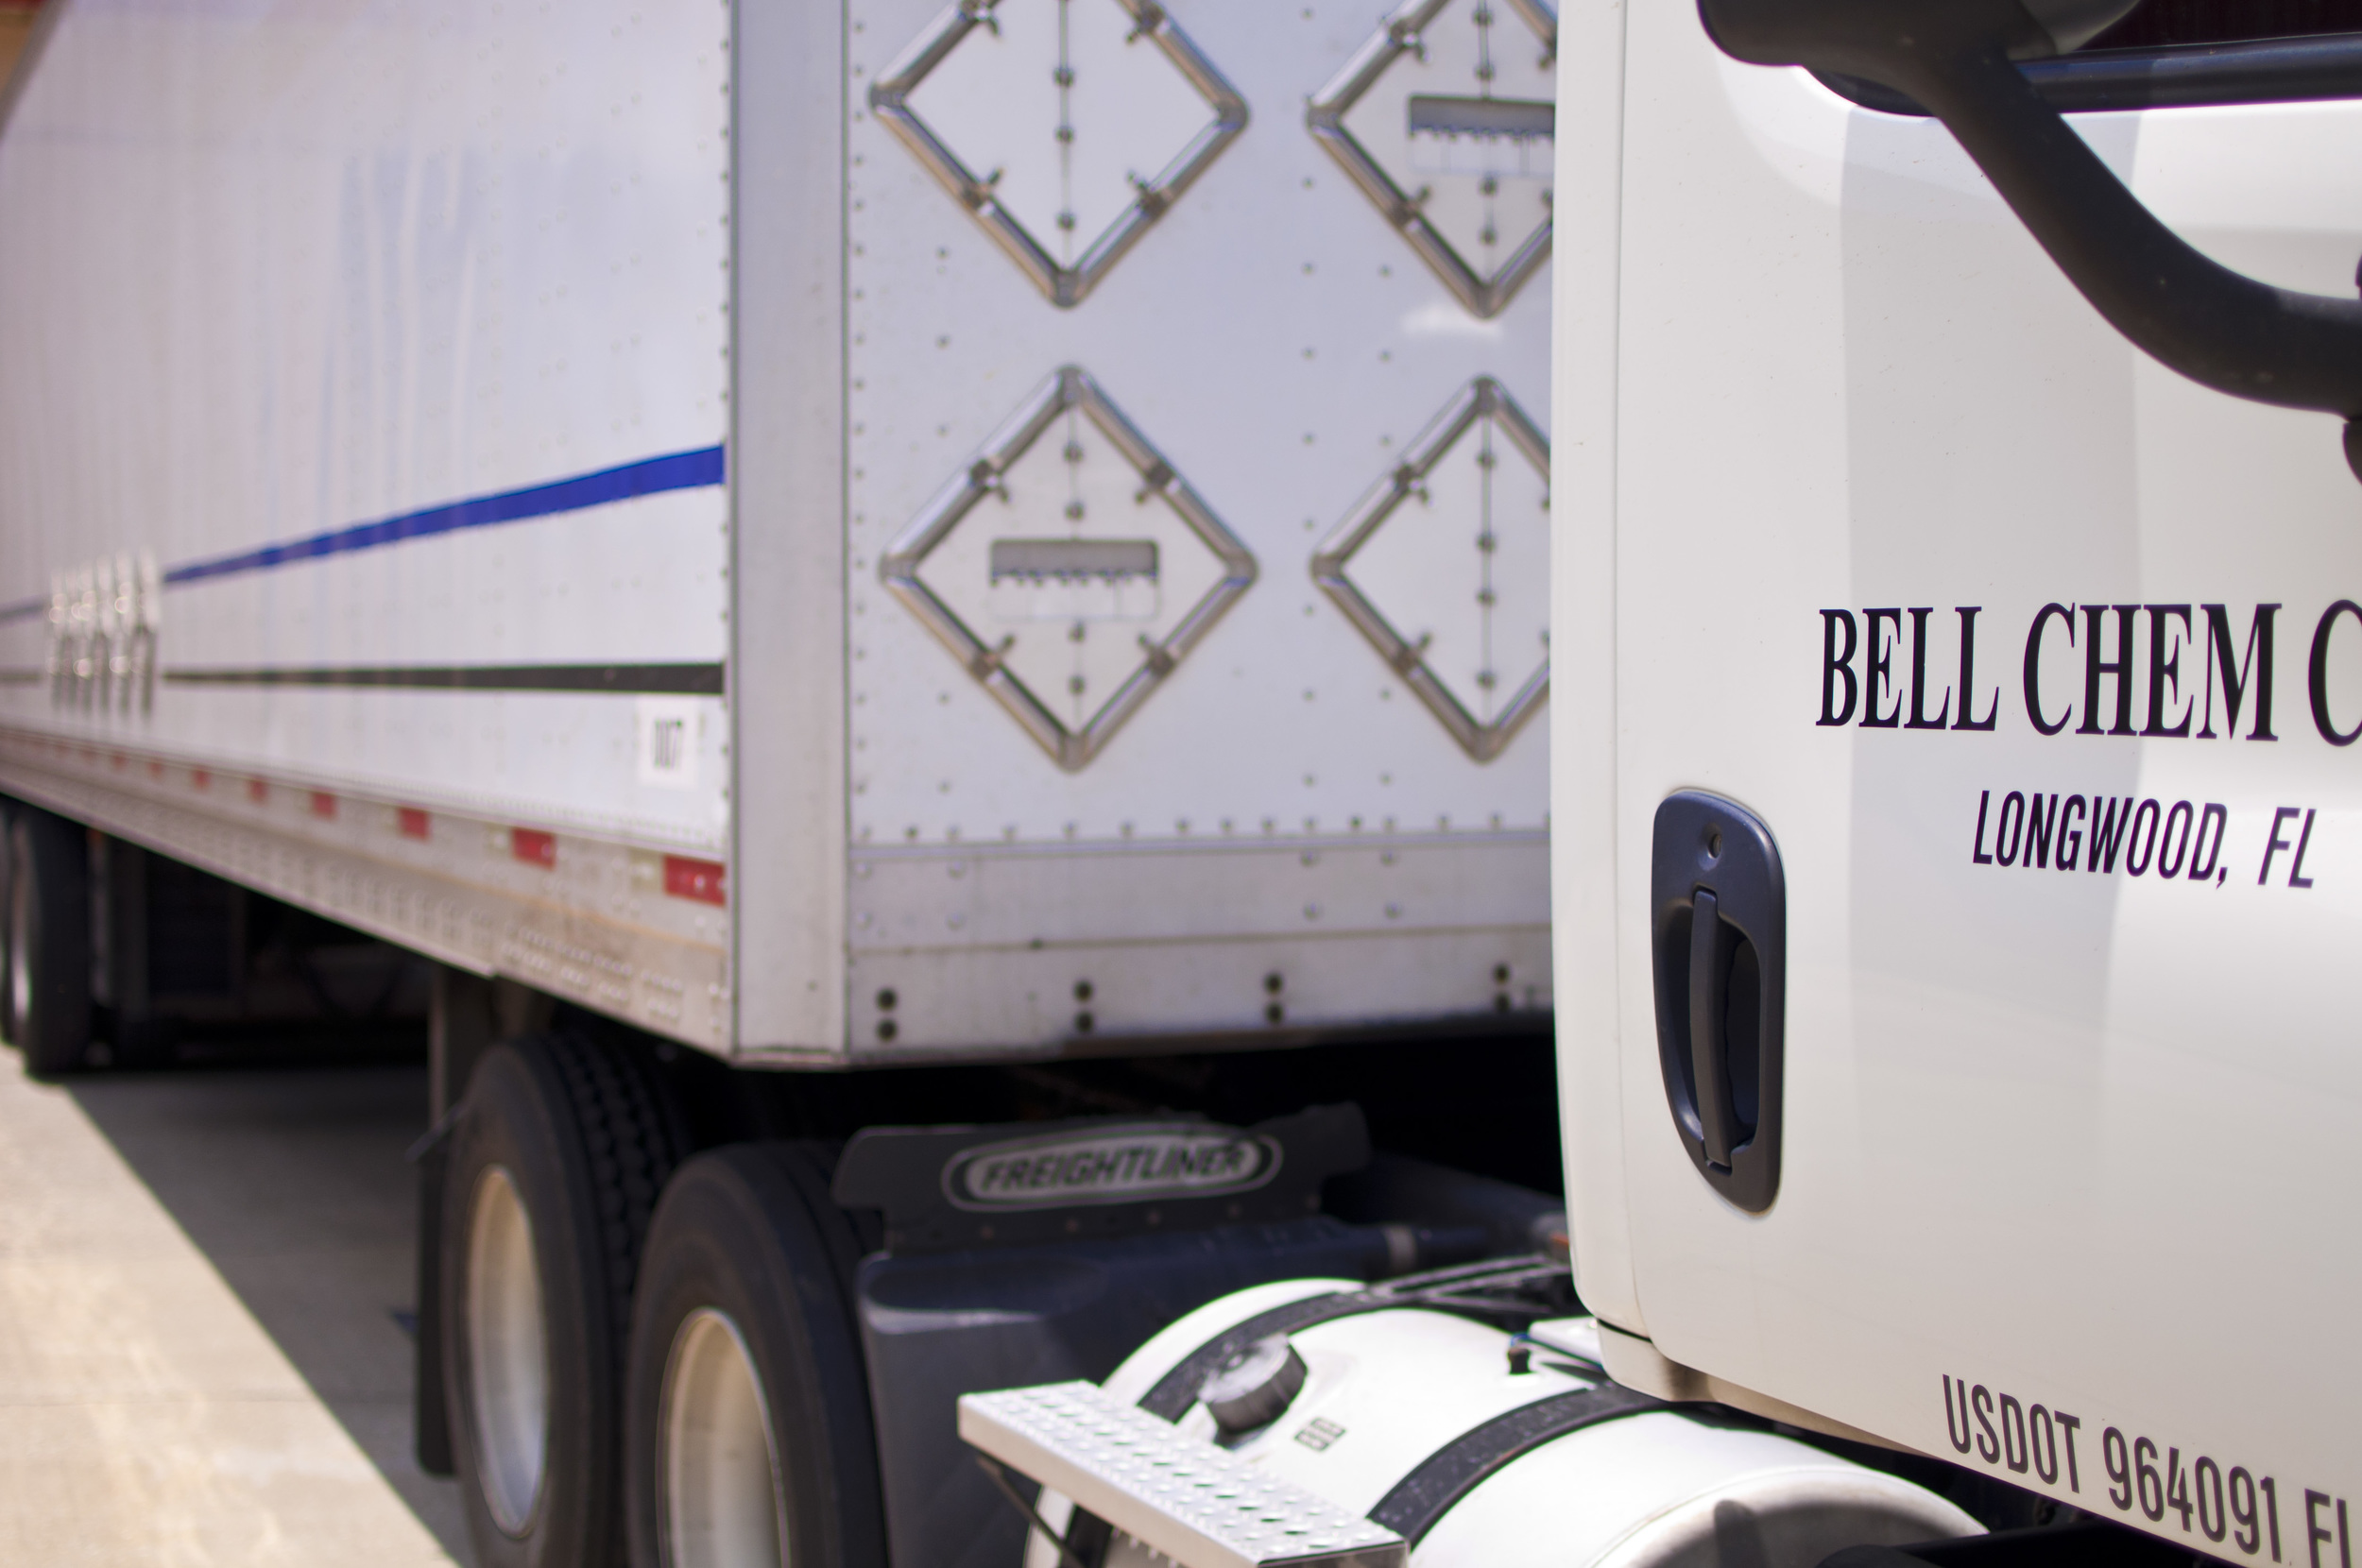 BC Truck.jpg